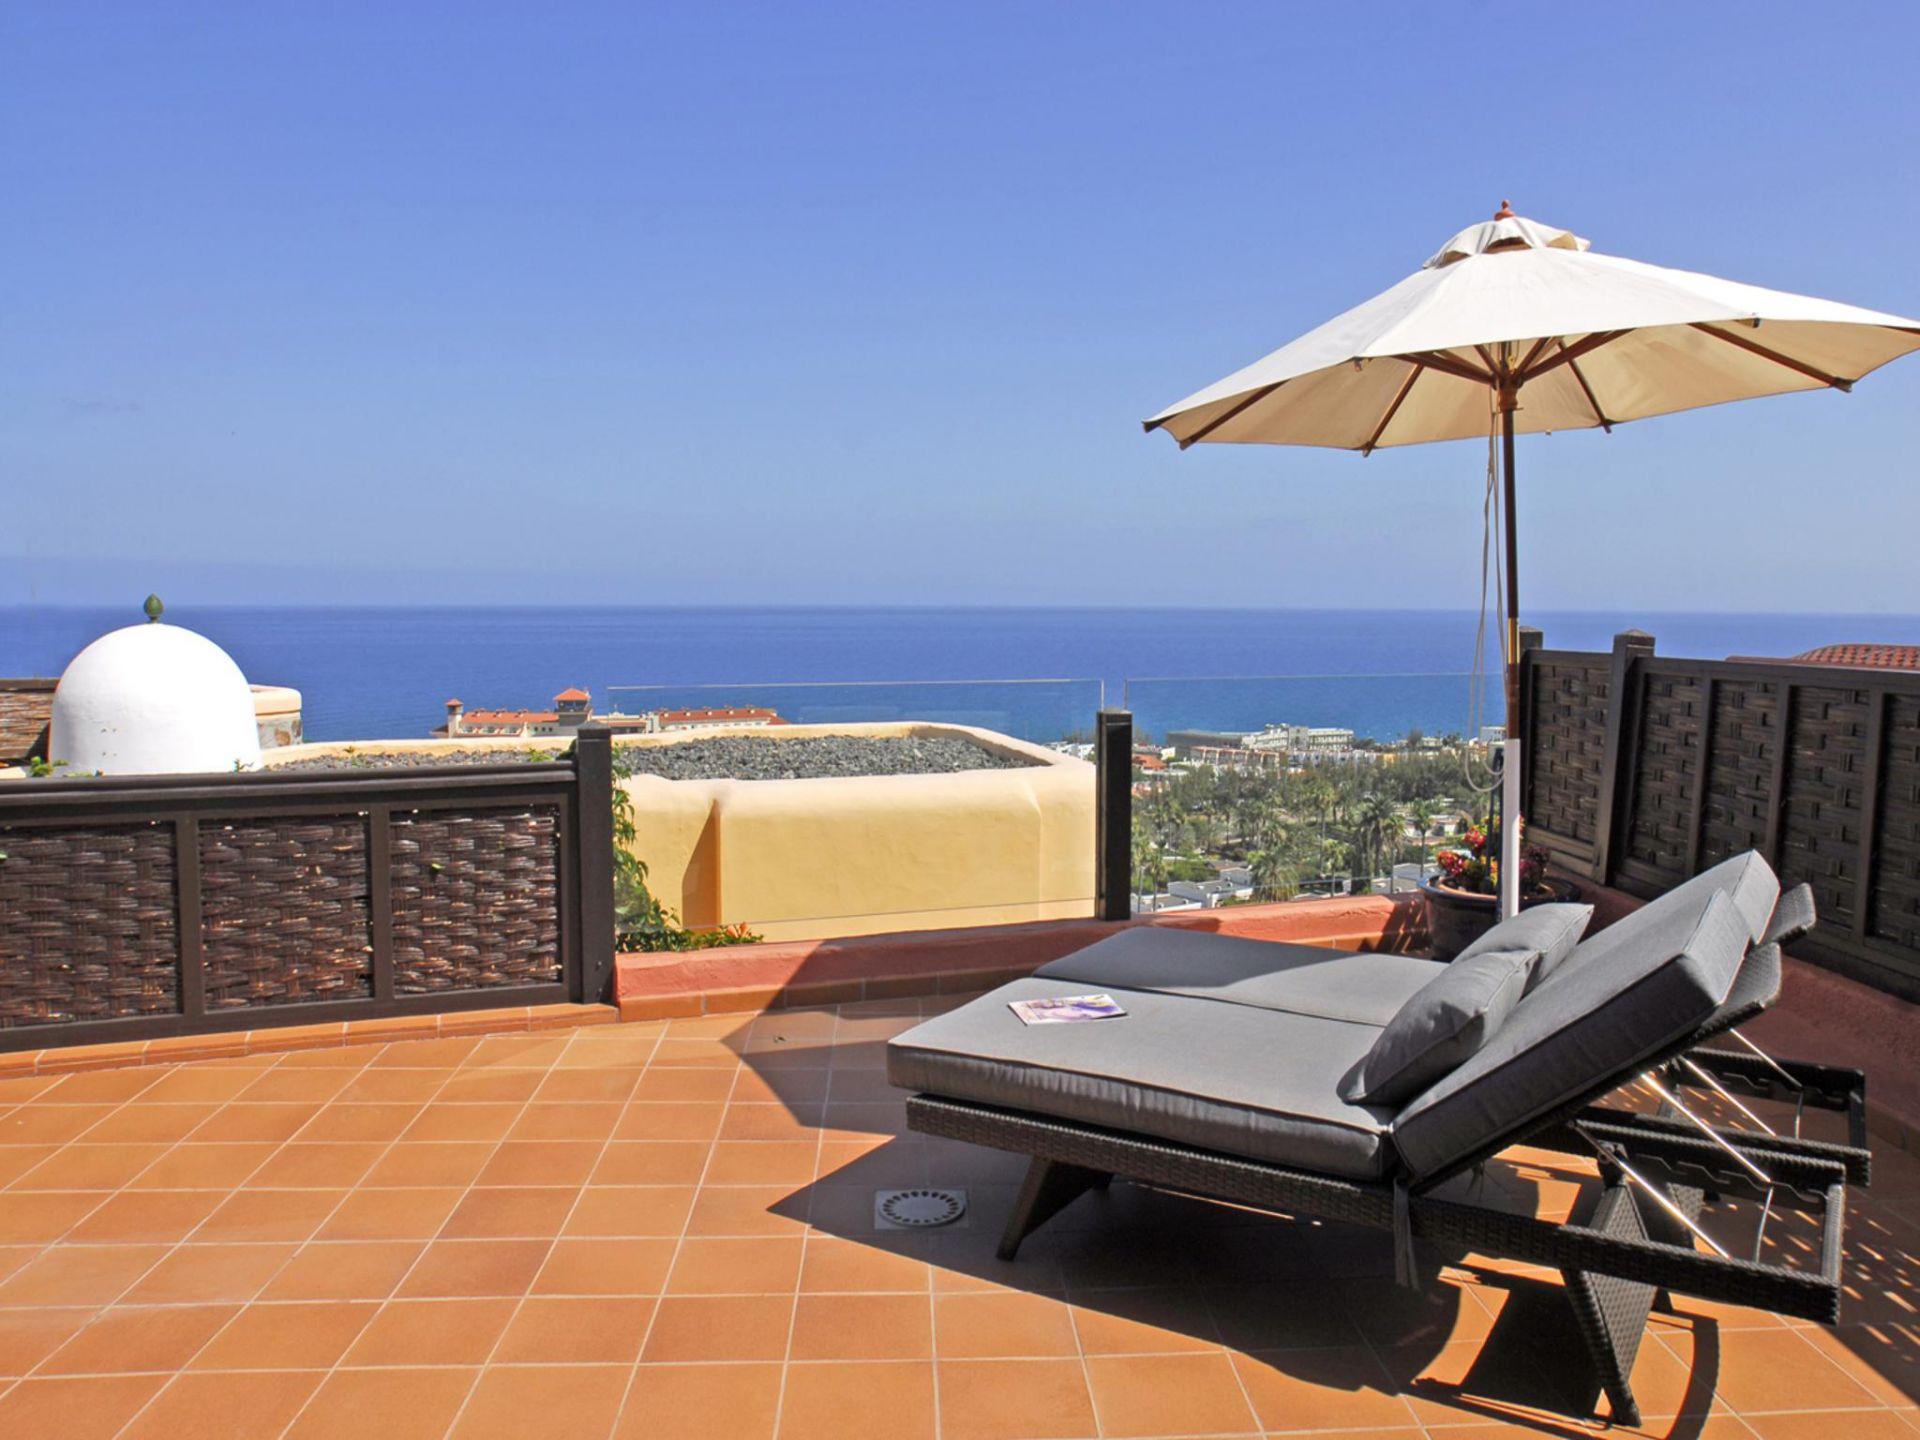 Holiday apartment Villa San Agustin 10 - Holiday Rental (854295), Maspalomas, Gran Canaria, Canary Islands, Spain, picture 4